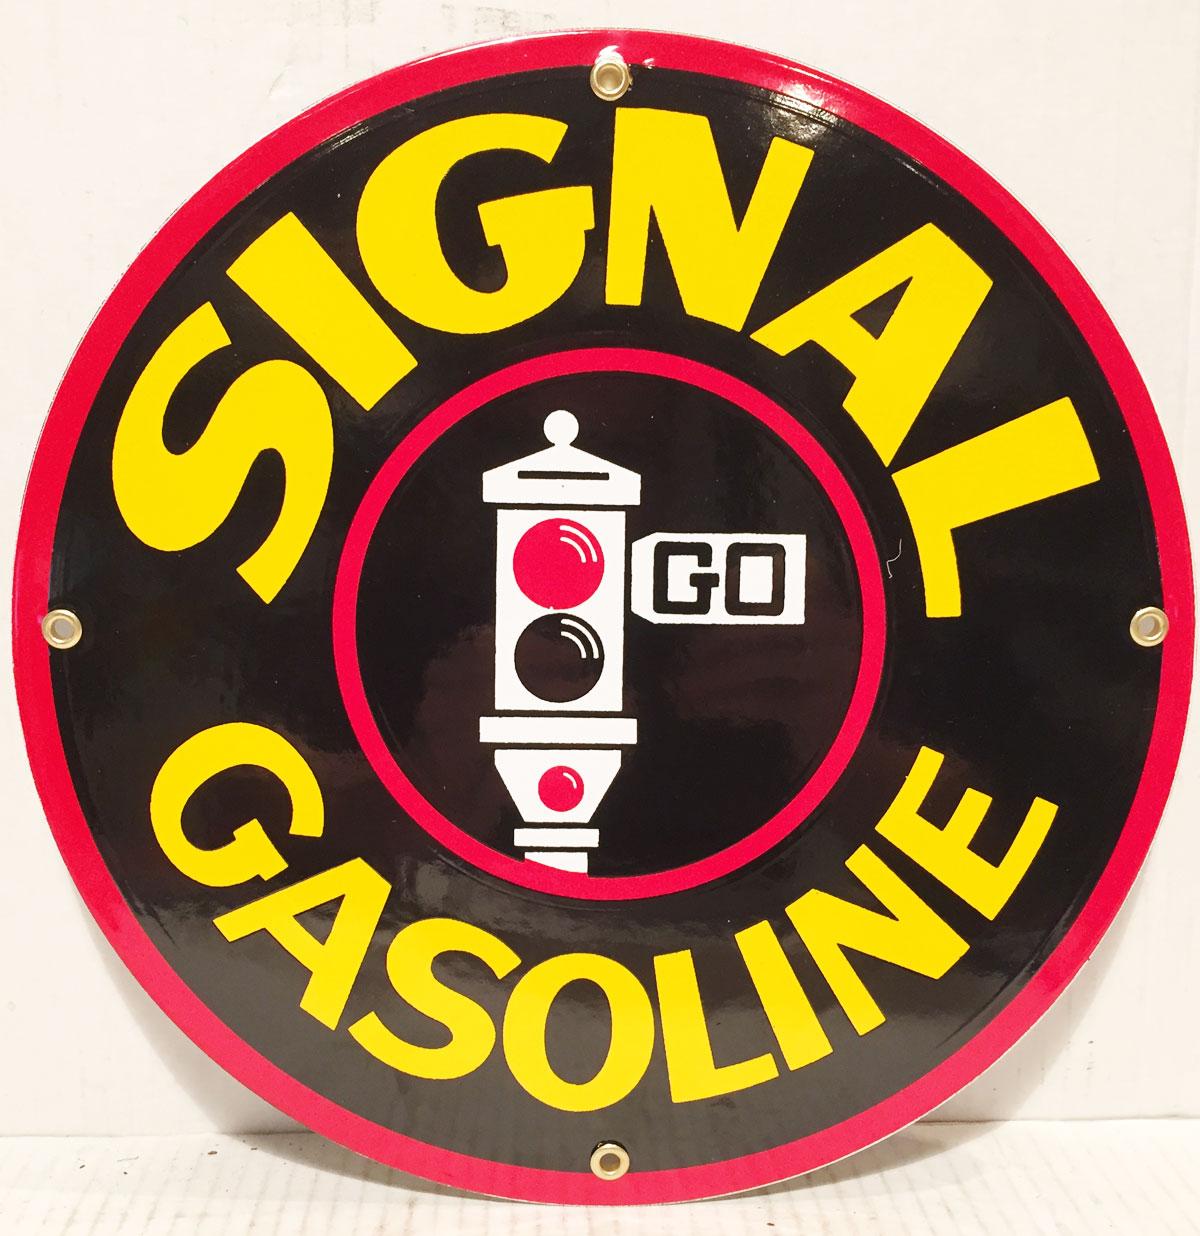 Signal Gasoline Emaille Bord 12 - 30 cm